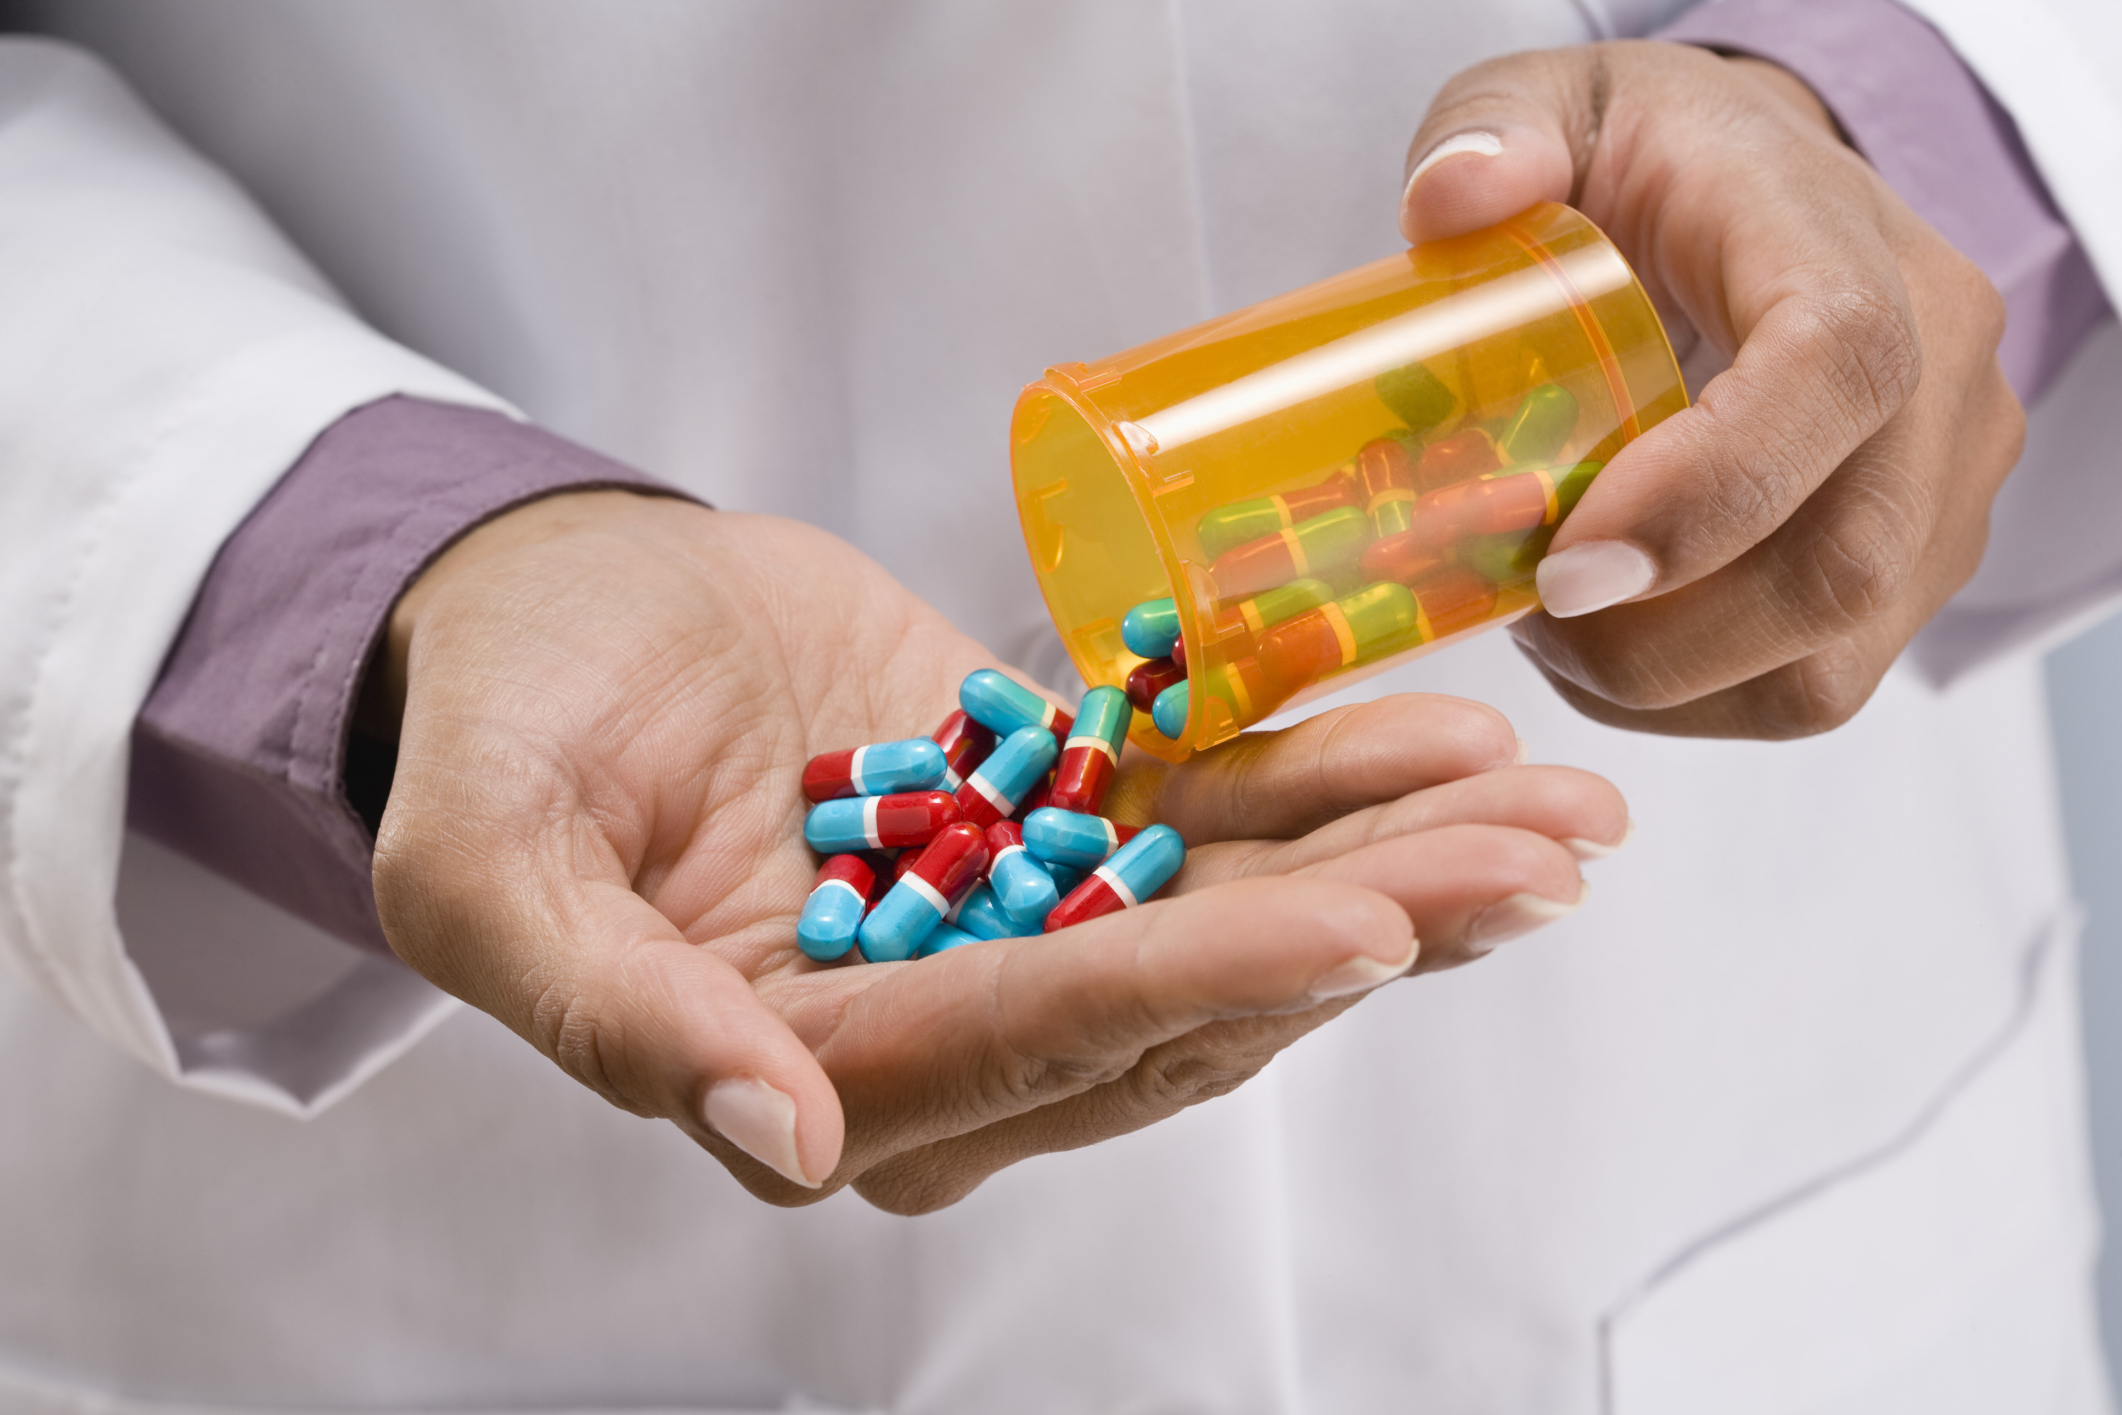 Herbal & Vitamins With Klonopin